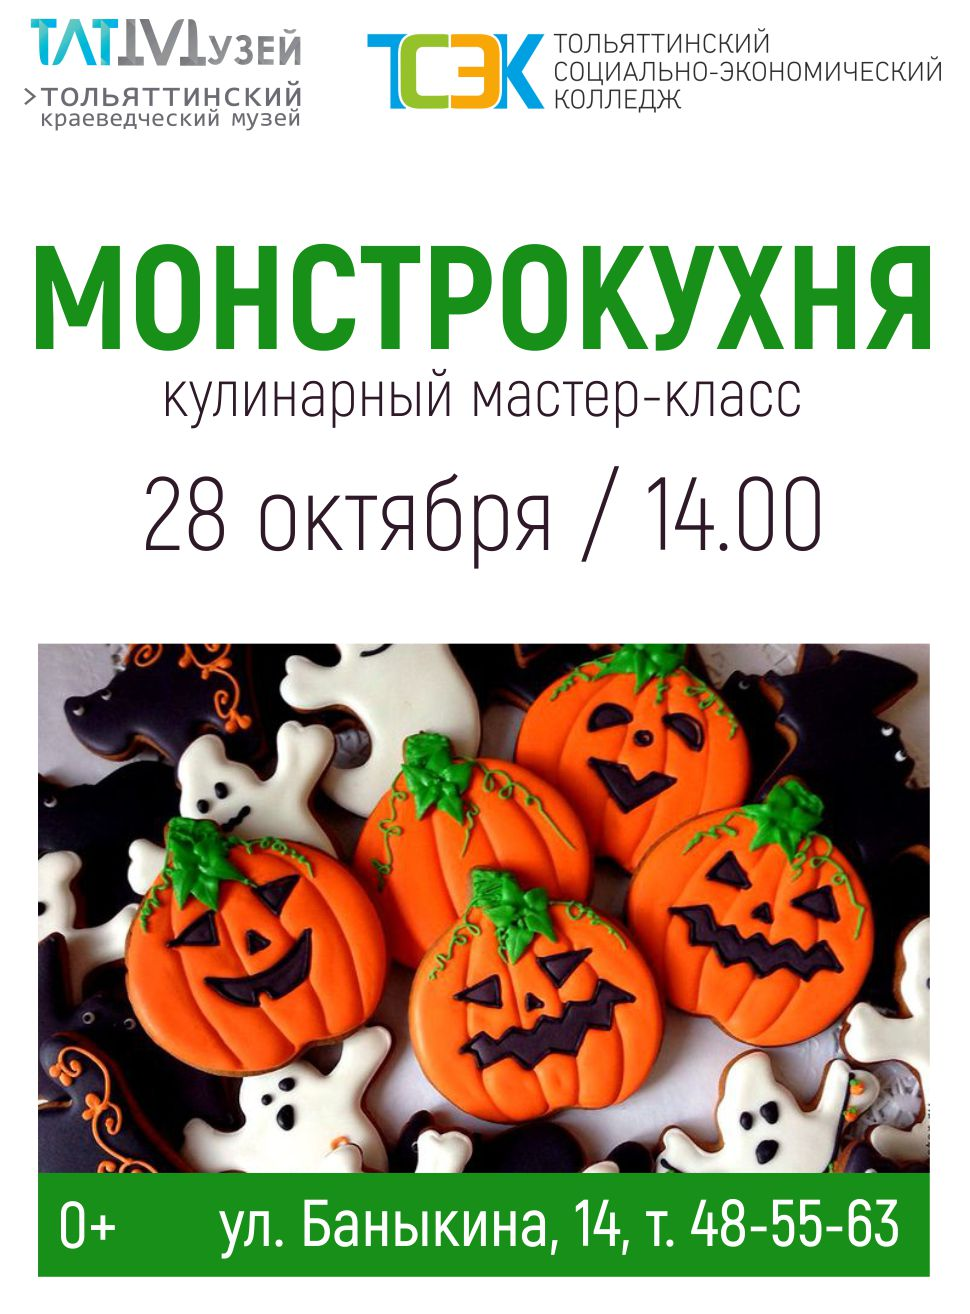 Кулинарный мастер-класс «МОНСТРОКУХНЯ»